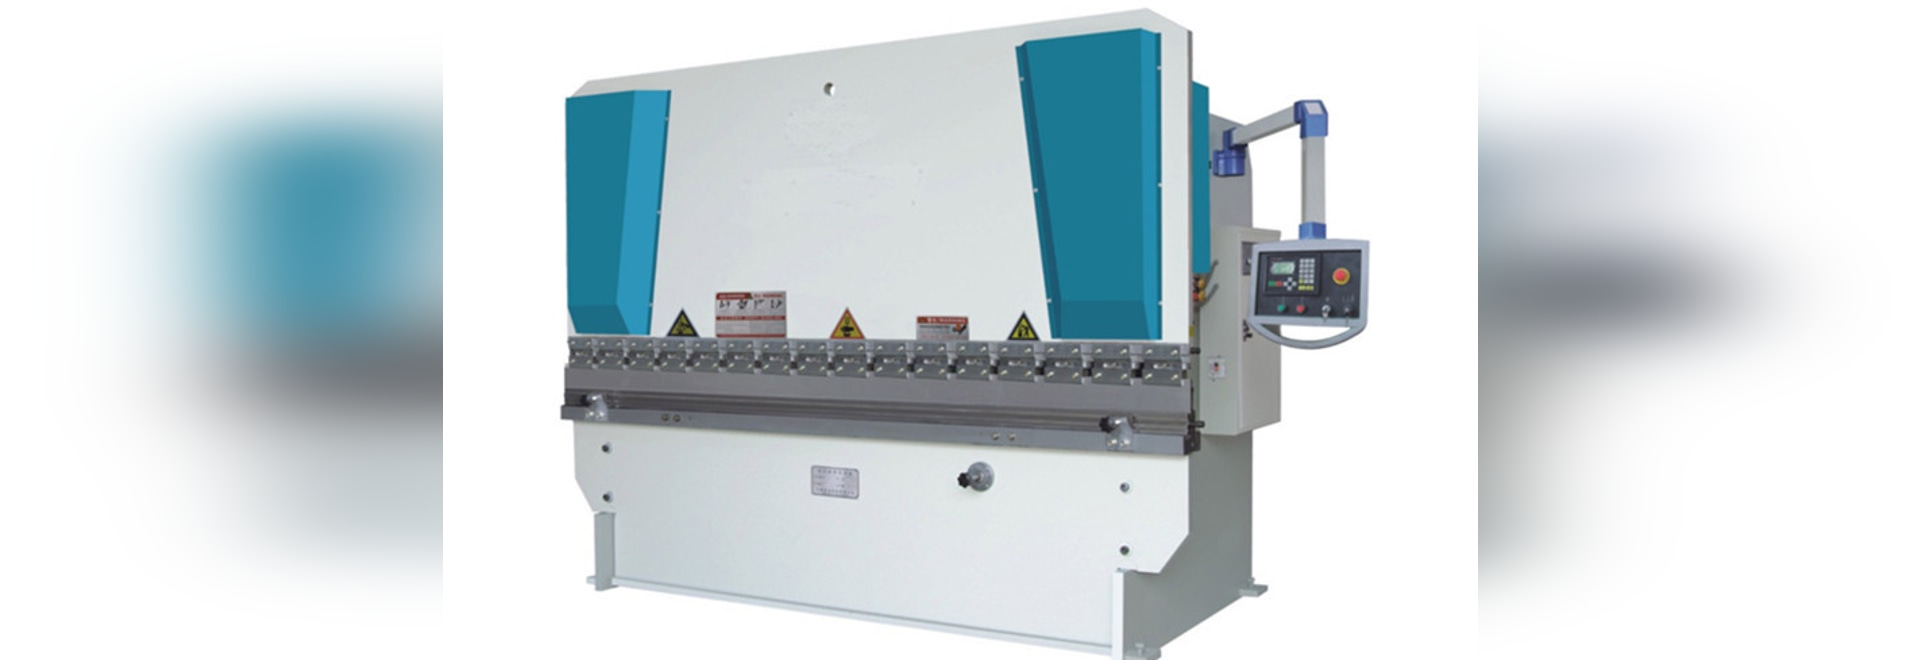 Technologien Co., Ltd. Shenzhens V&T